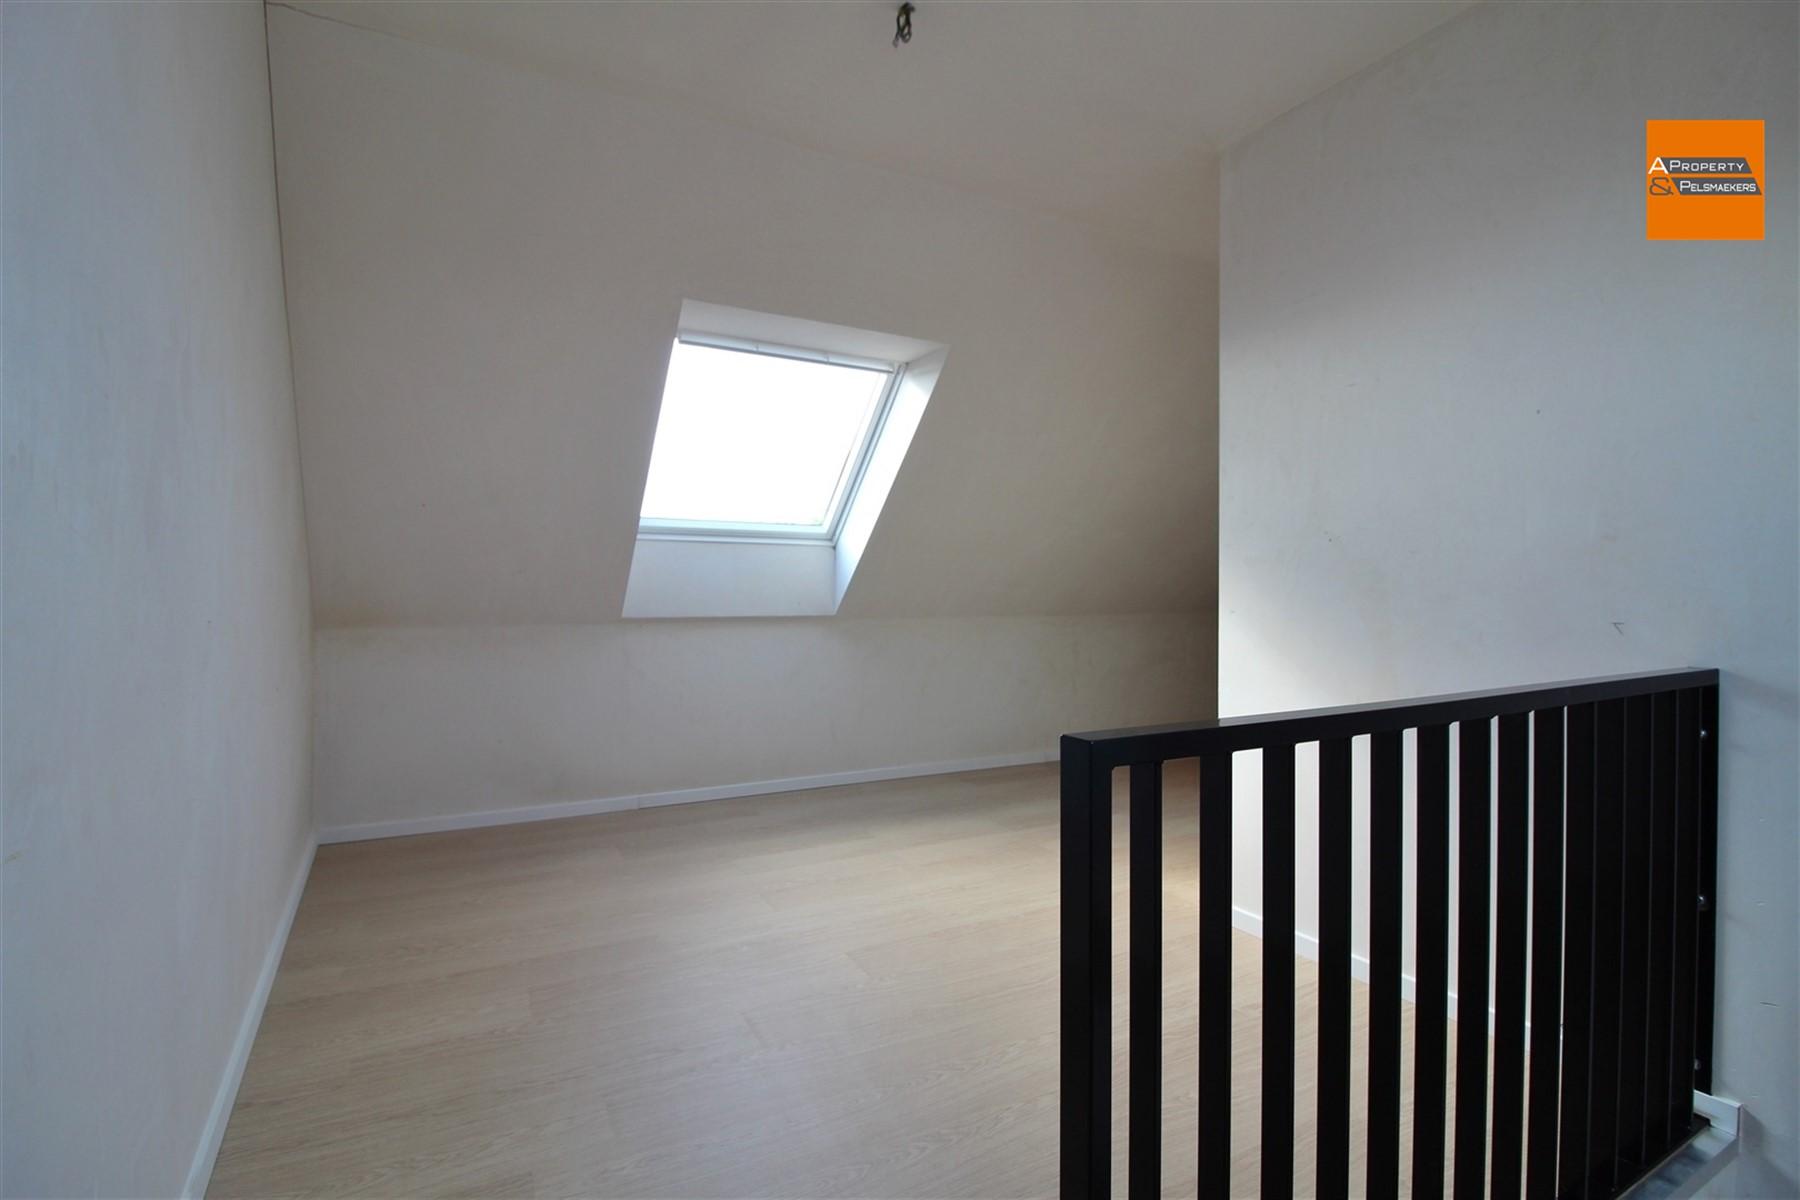 Foto 17 : Duplex/triplex in 3060 BERTEM (België) - Prijs € 319.000